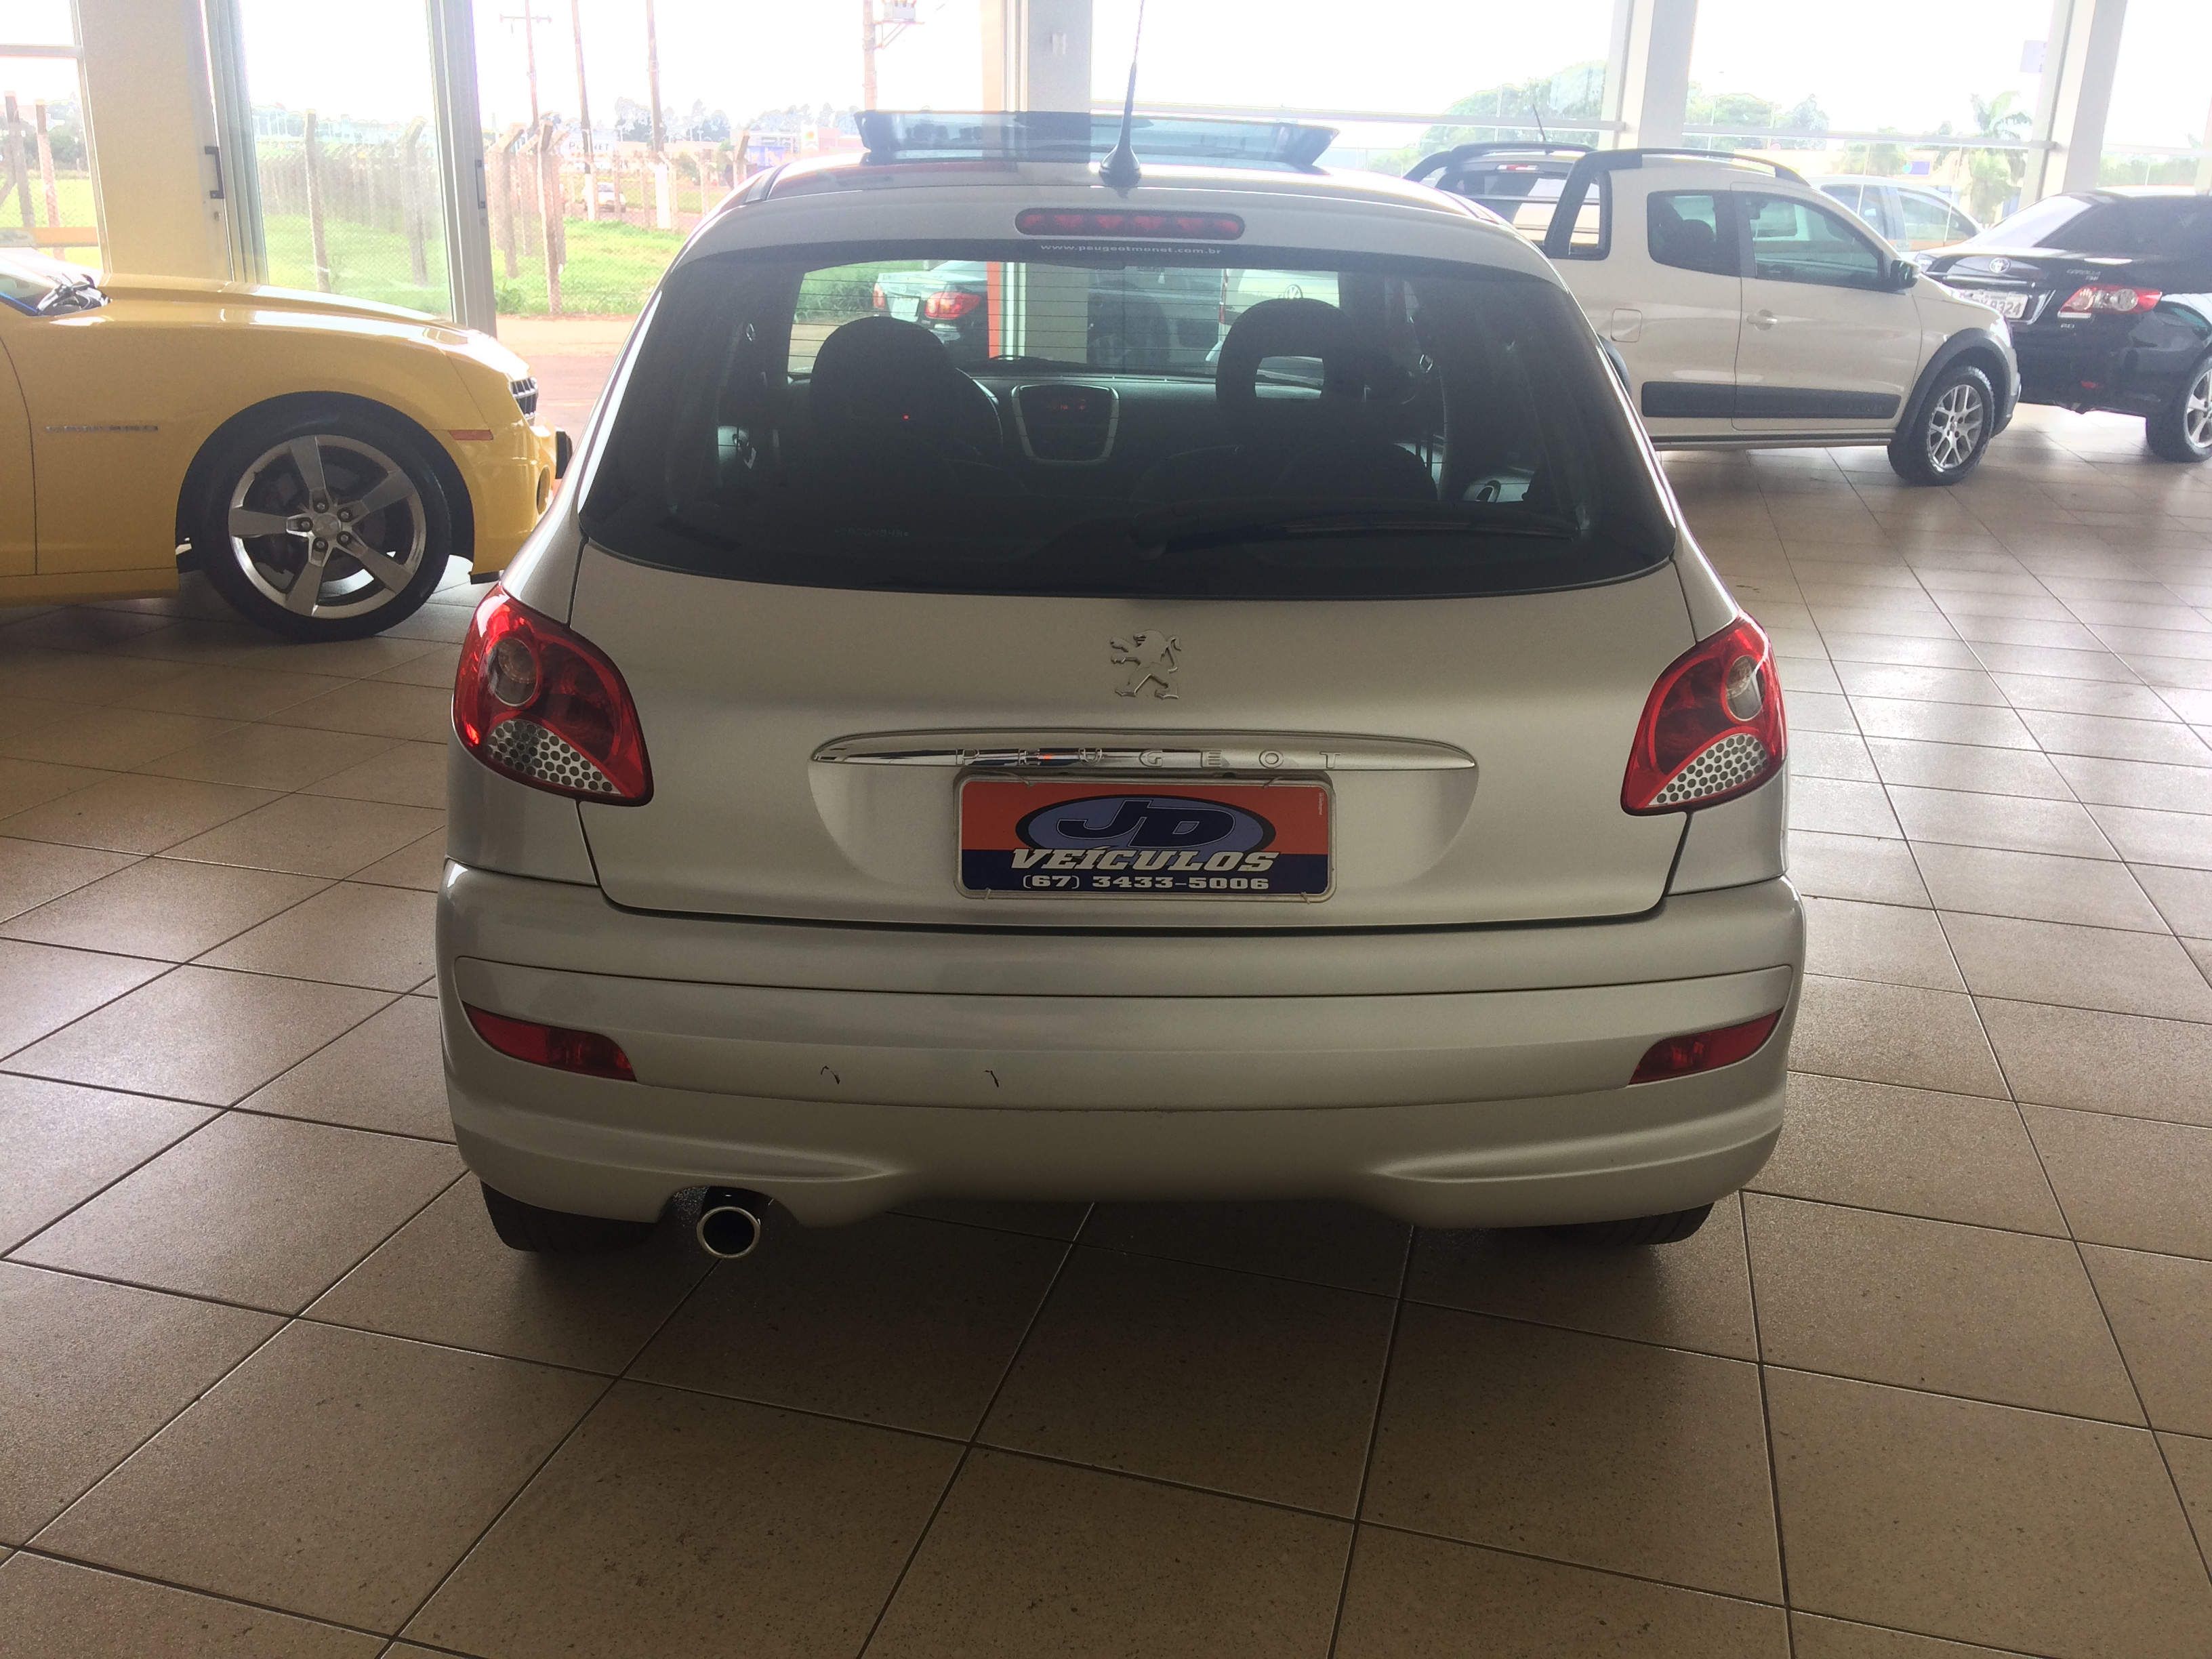 Precos Usados Peugeot 206 Quiksilver Waa2